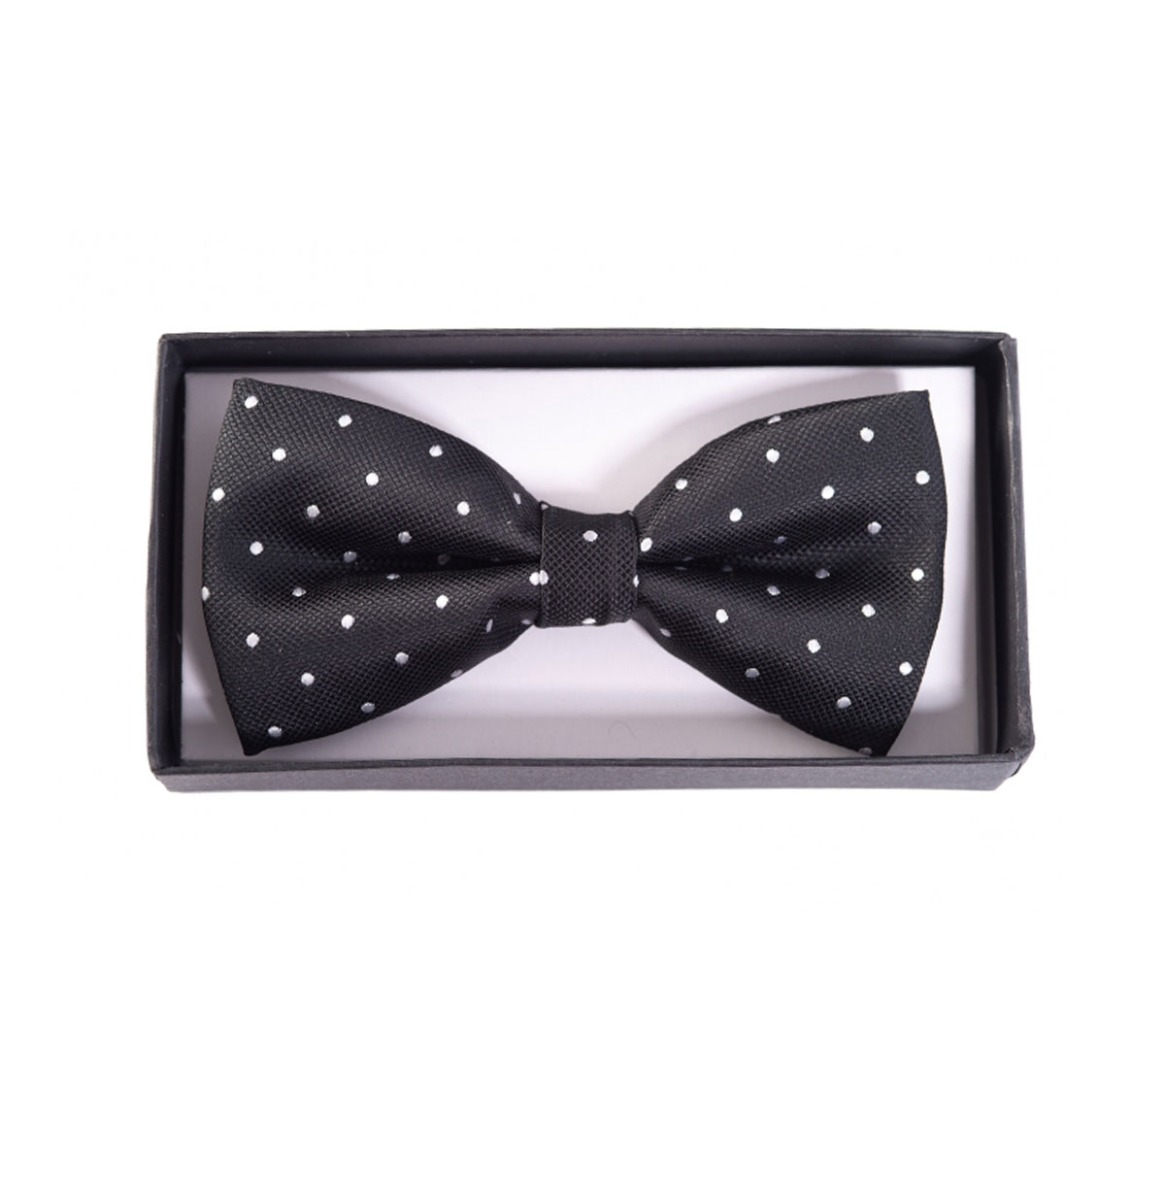 Ribbon Dance Bow Tie Black White Polka Dots